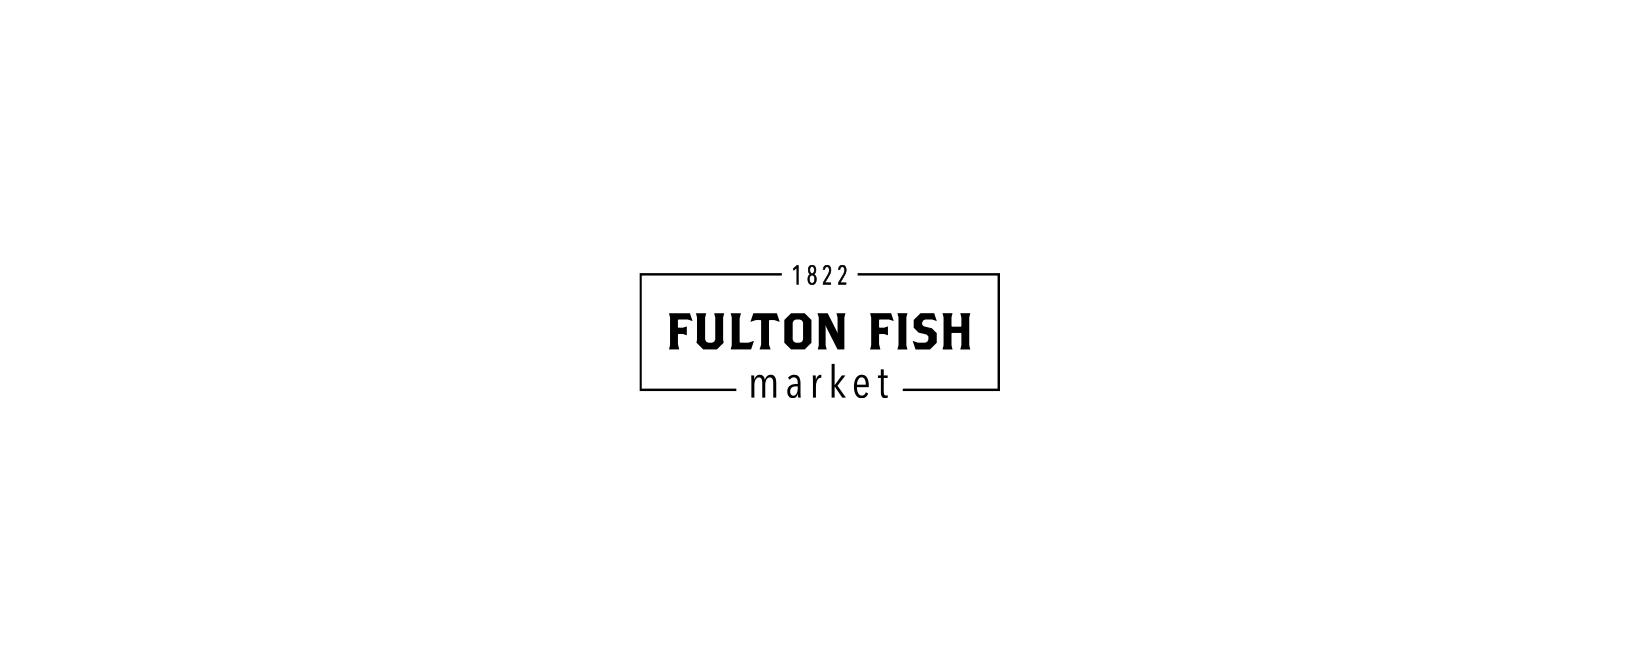 Fulton Fish Market Coupons Code 2021